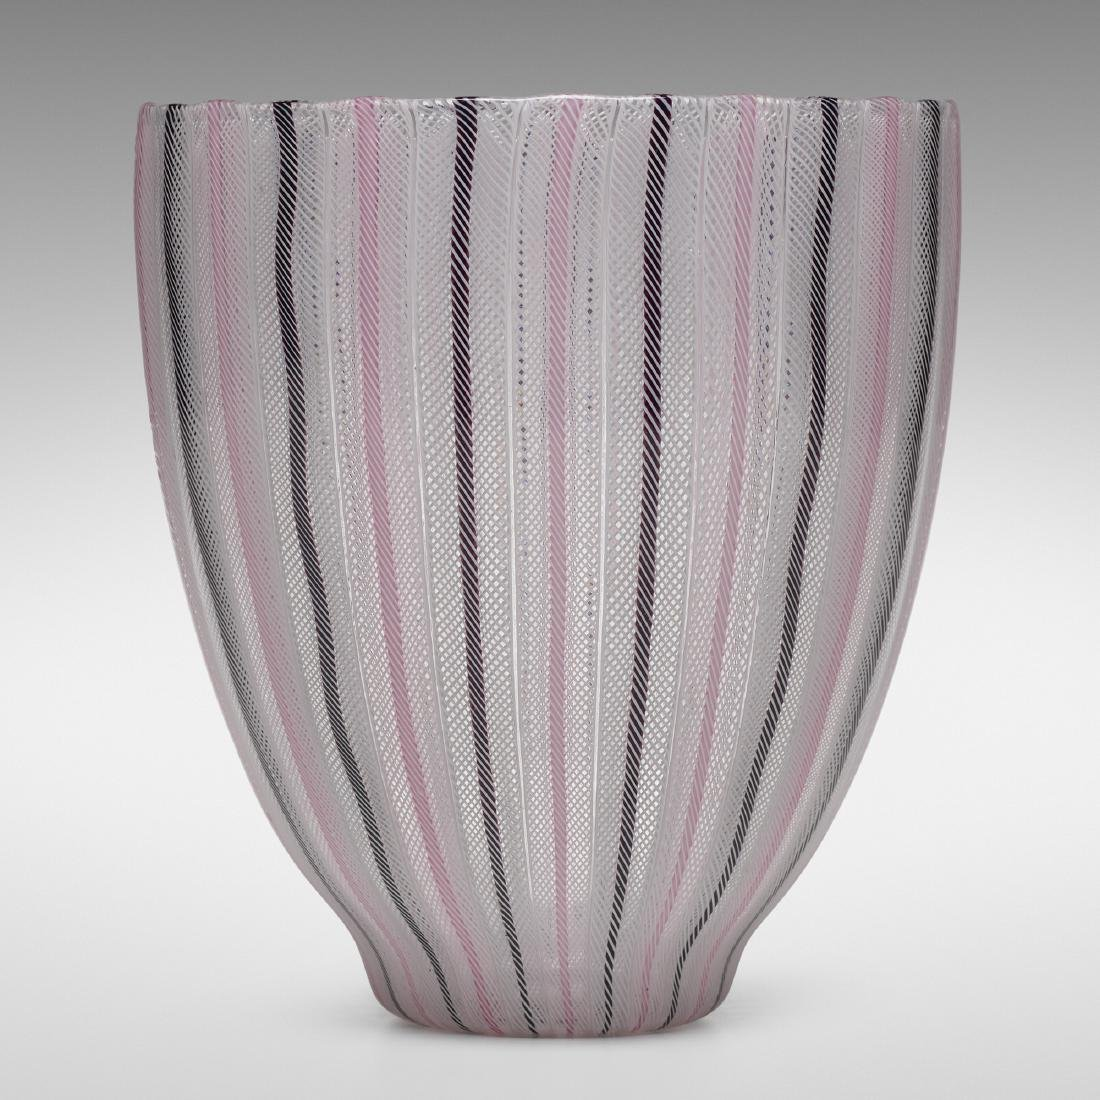 Paolo Venini, Zanfirico vase, model 3784